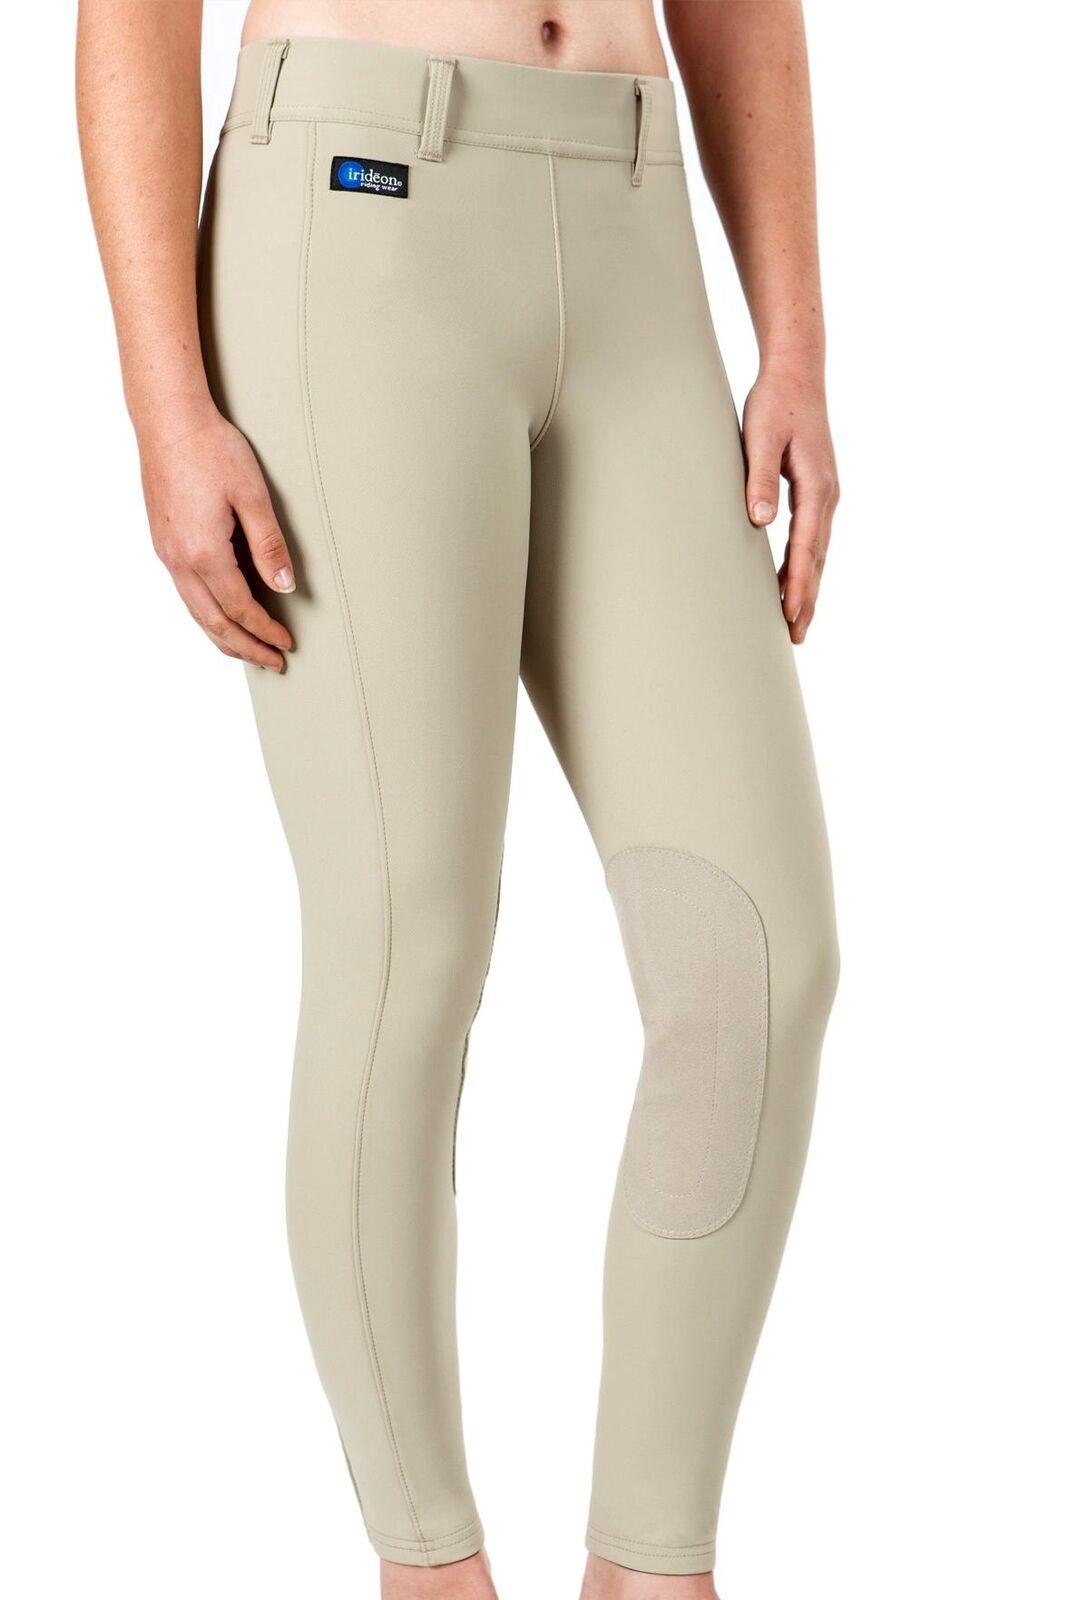 Irideon Women's Cadence Elite Knee Patch Riding Breeches Stretch-Woven